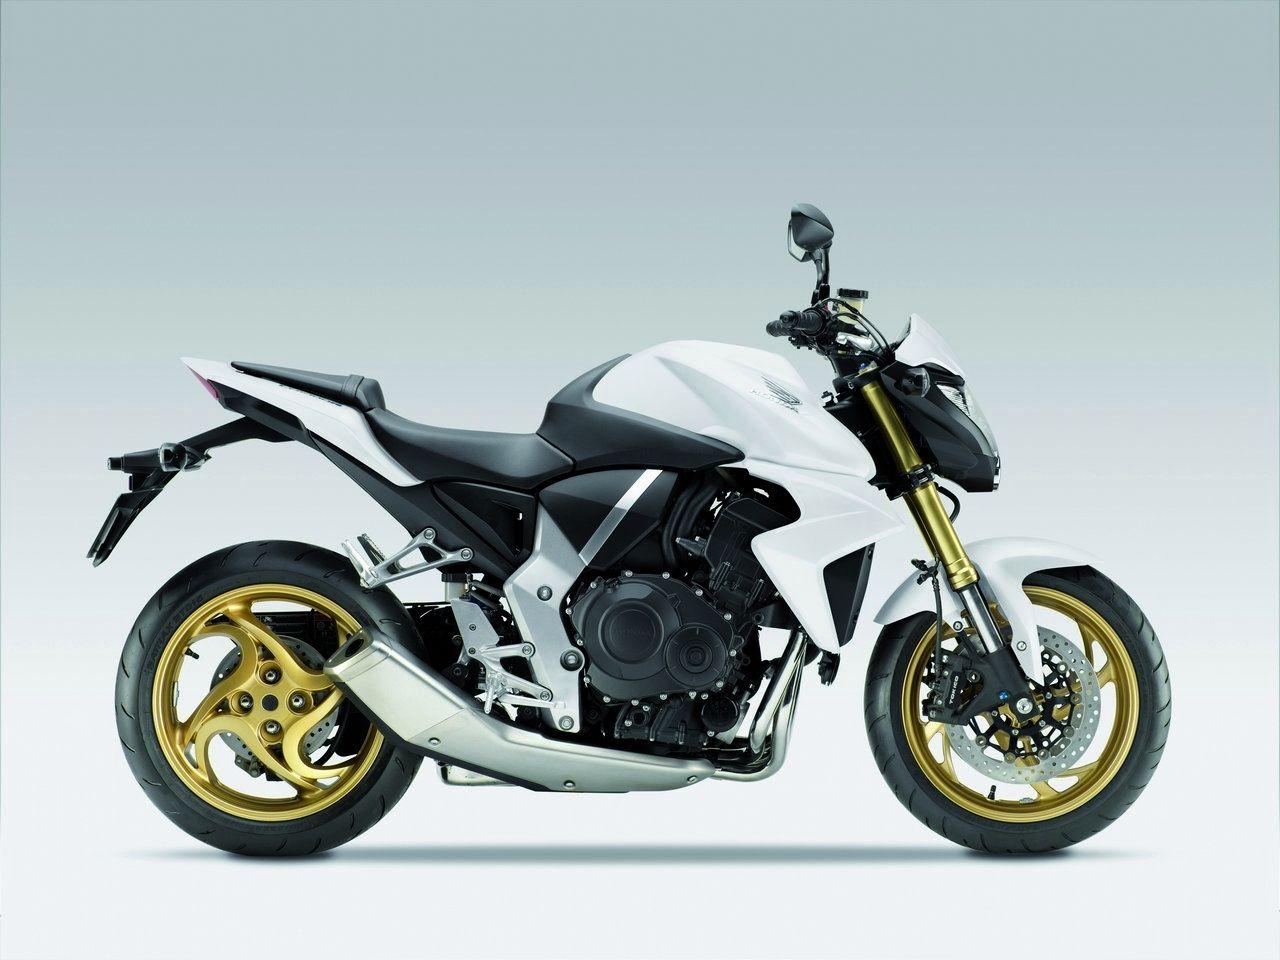 Honda CB1000R 2013   Moto   Pinterest   Honda and Wheels